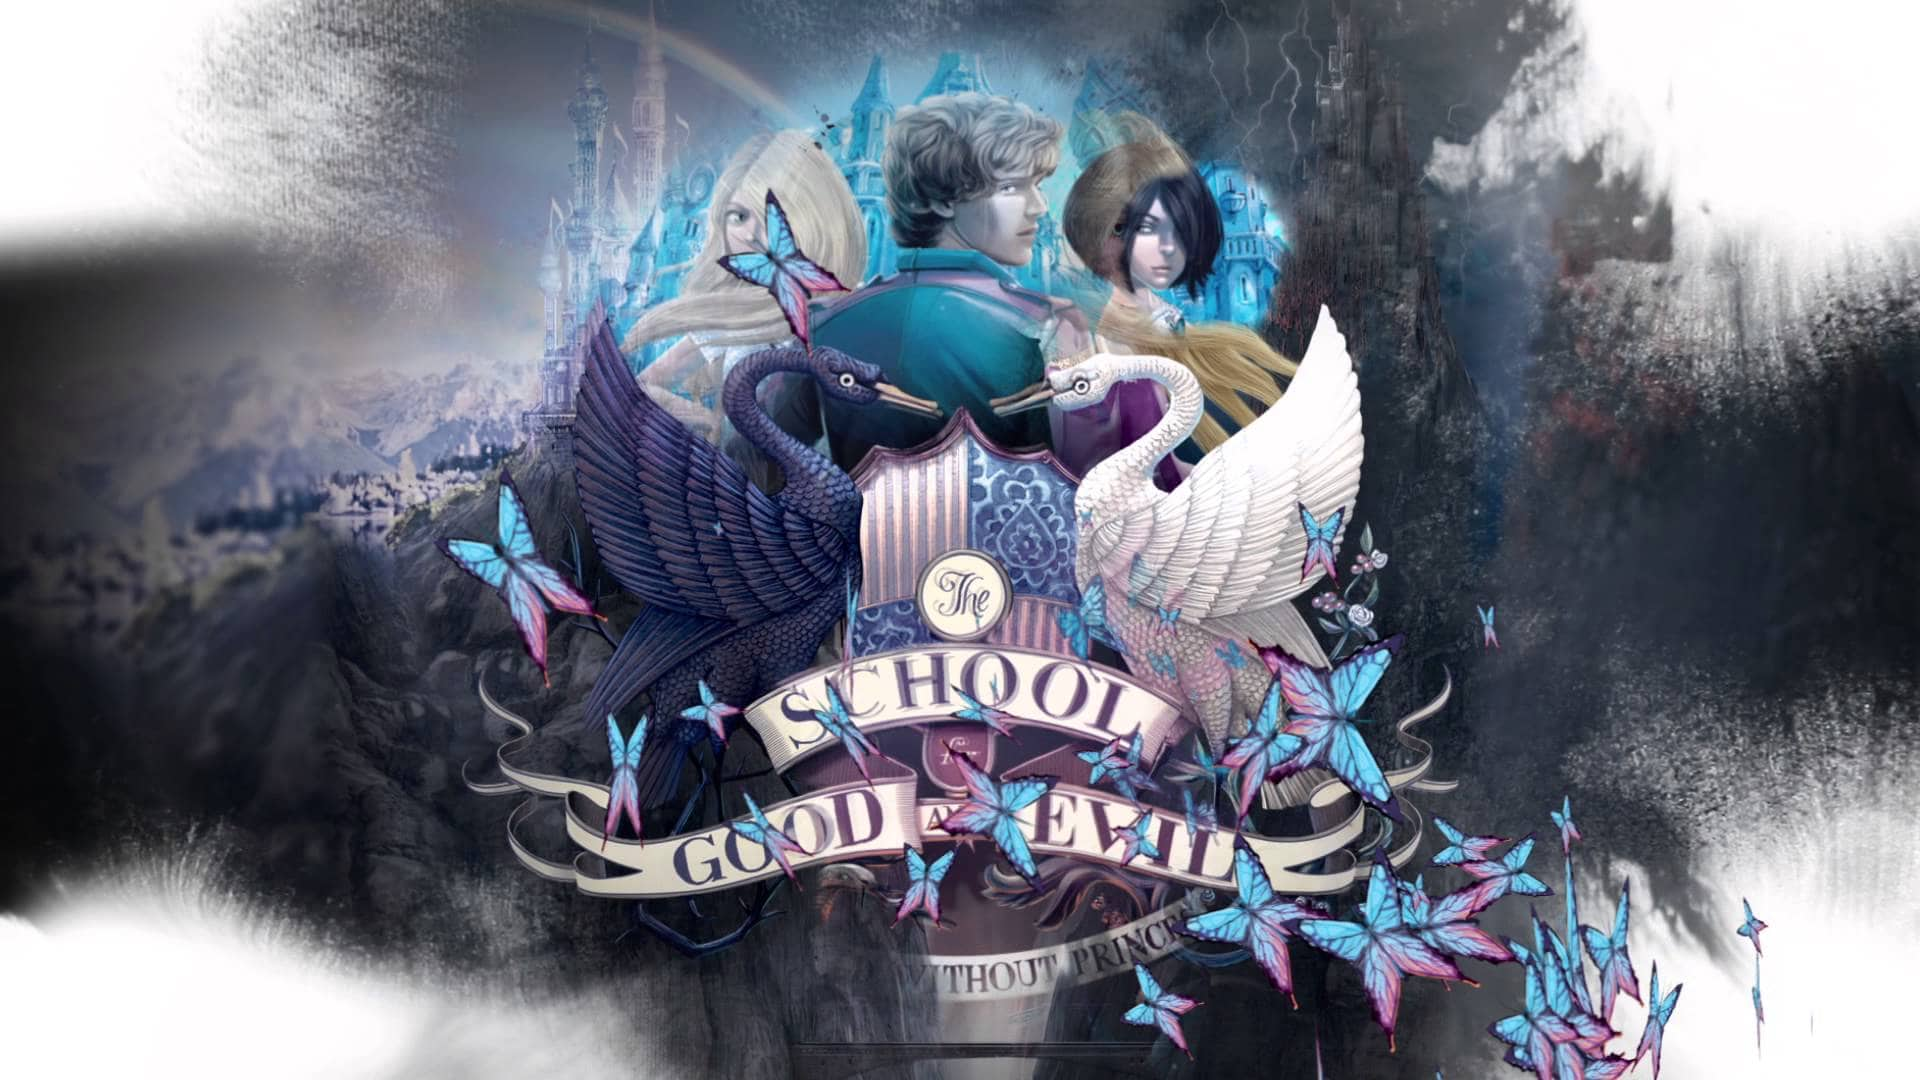 Good And Evil school